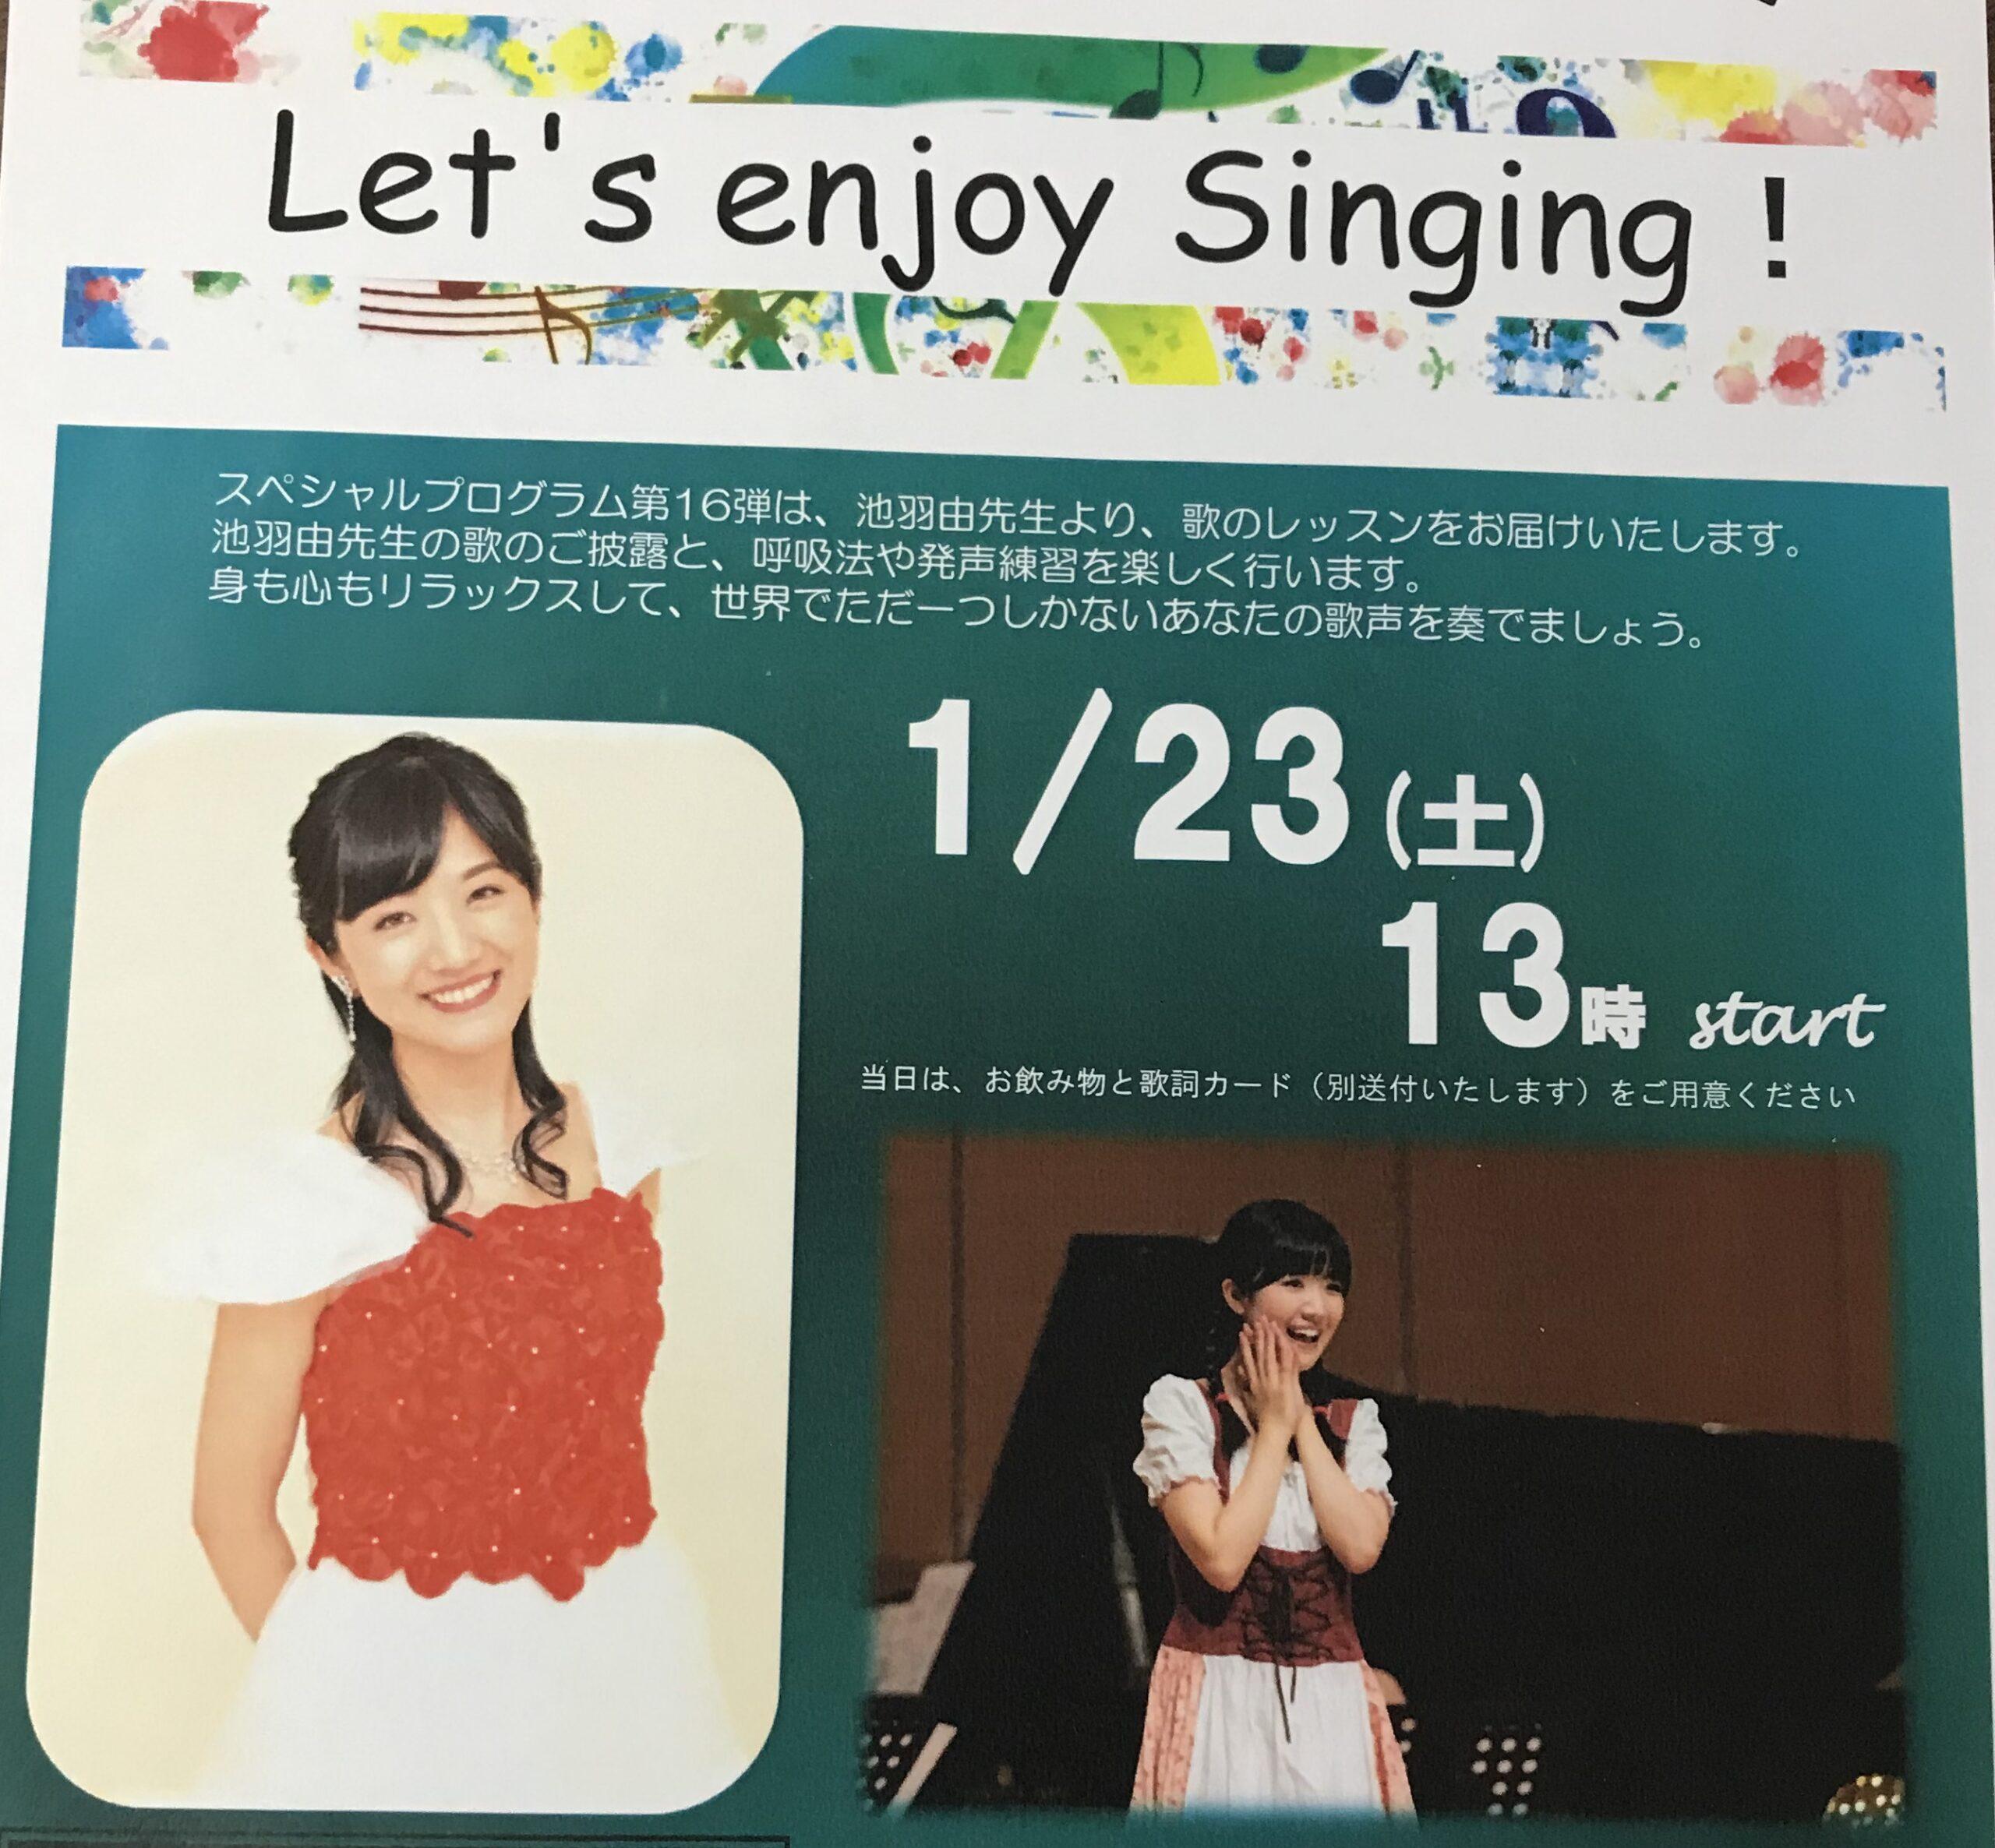 「Let's enjoy Singing!」に参加しました♪